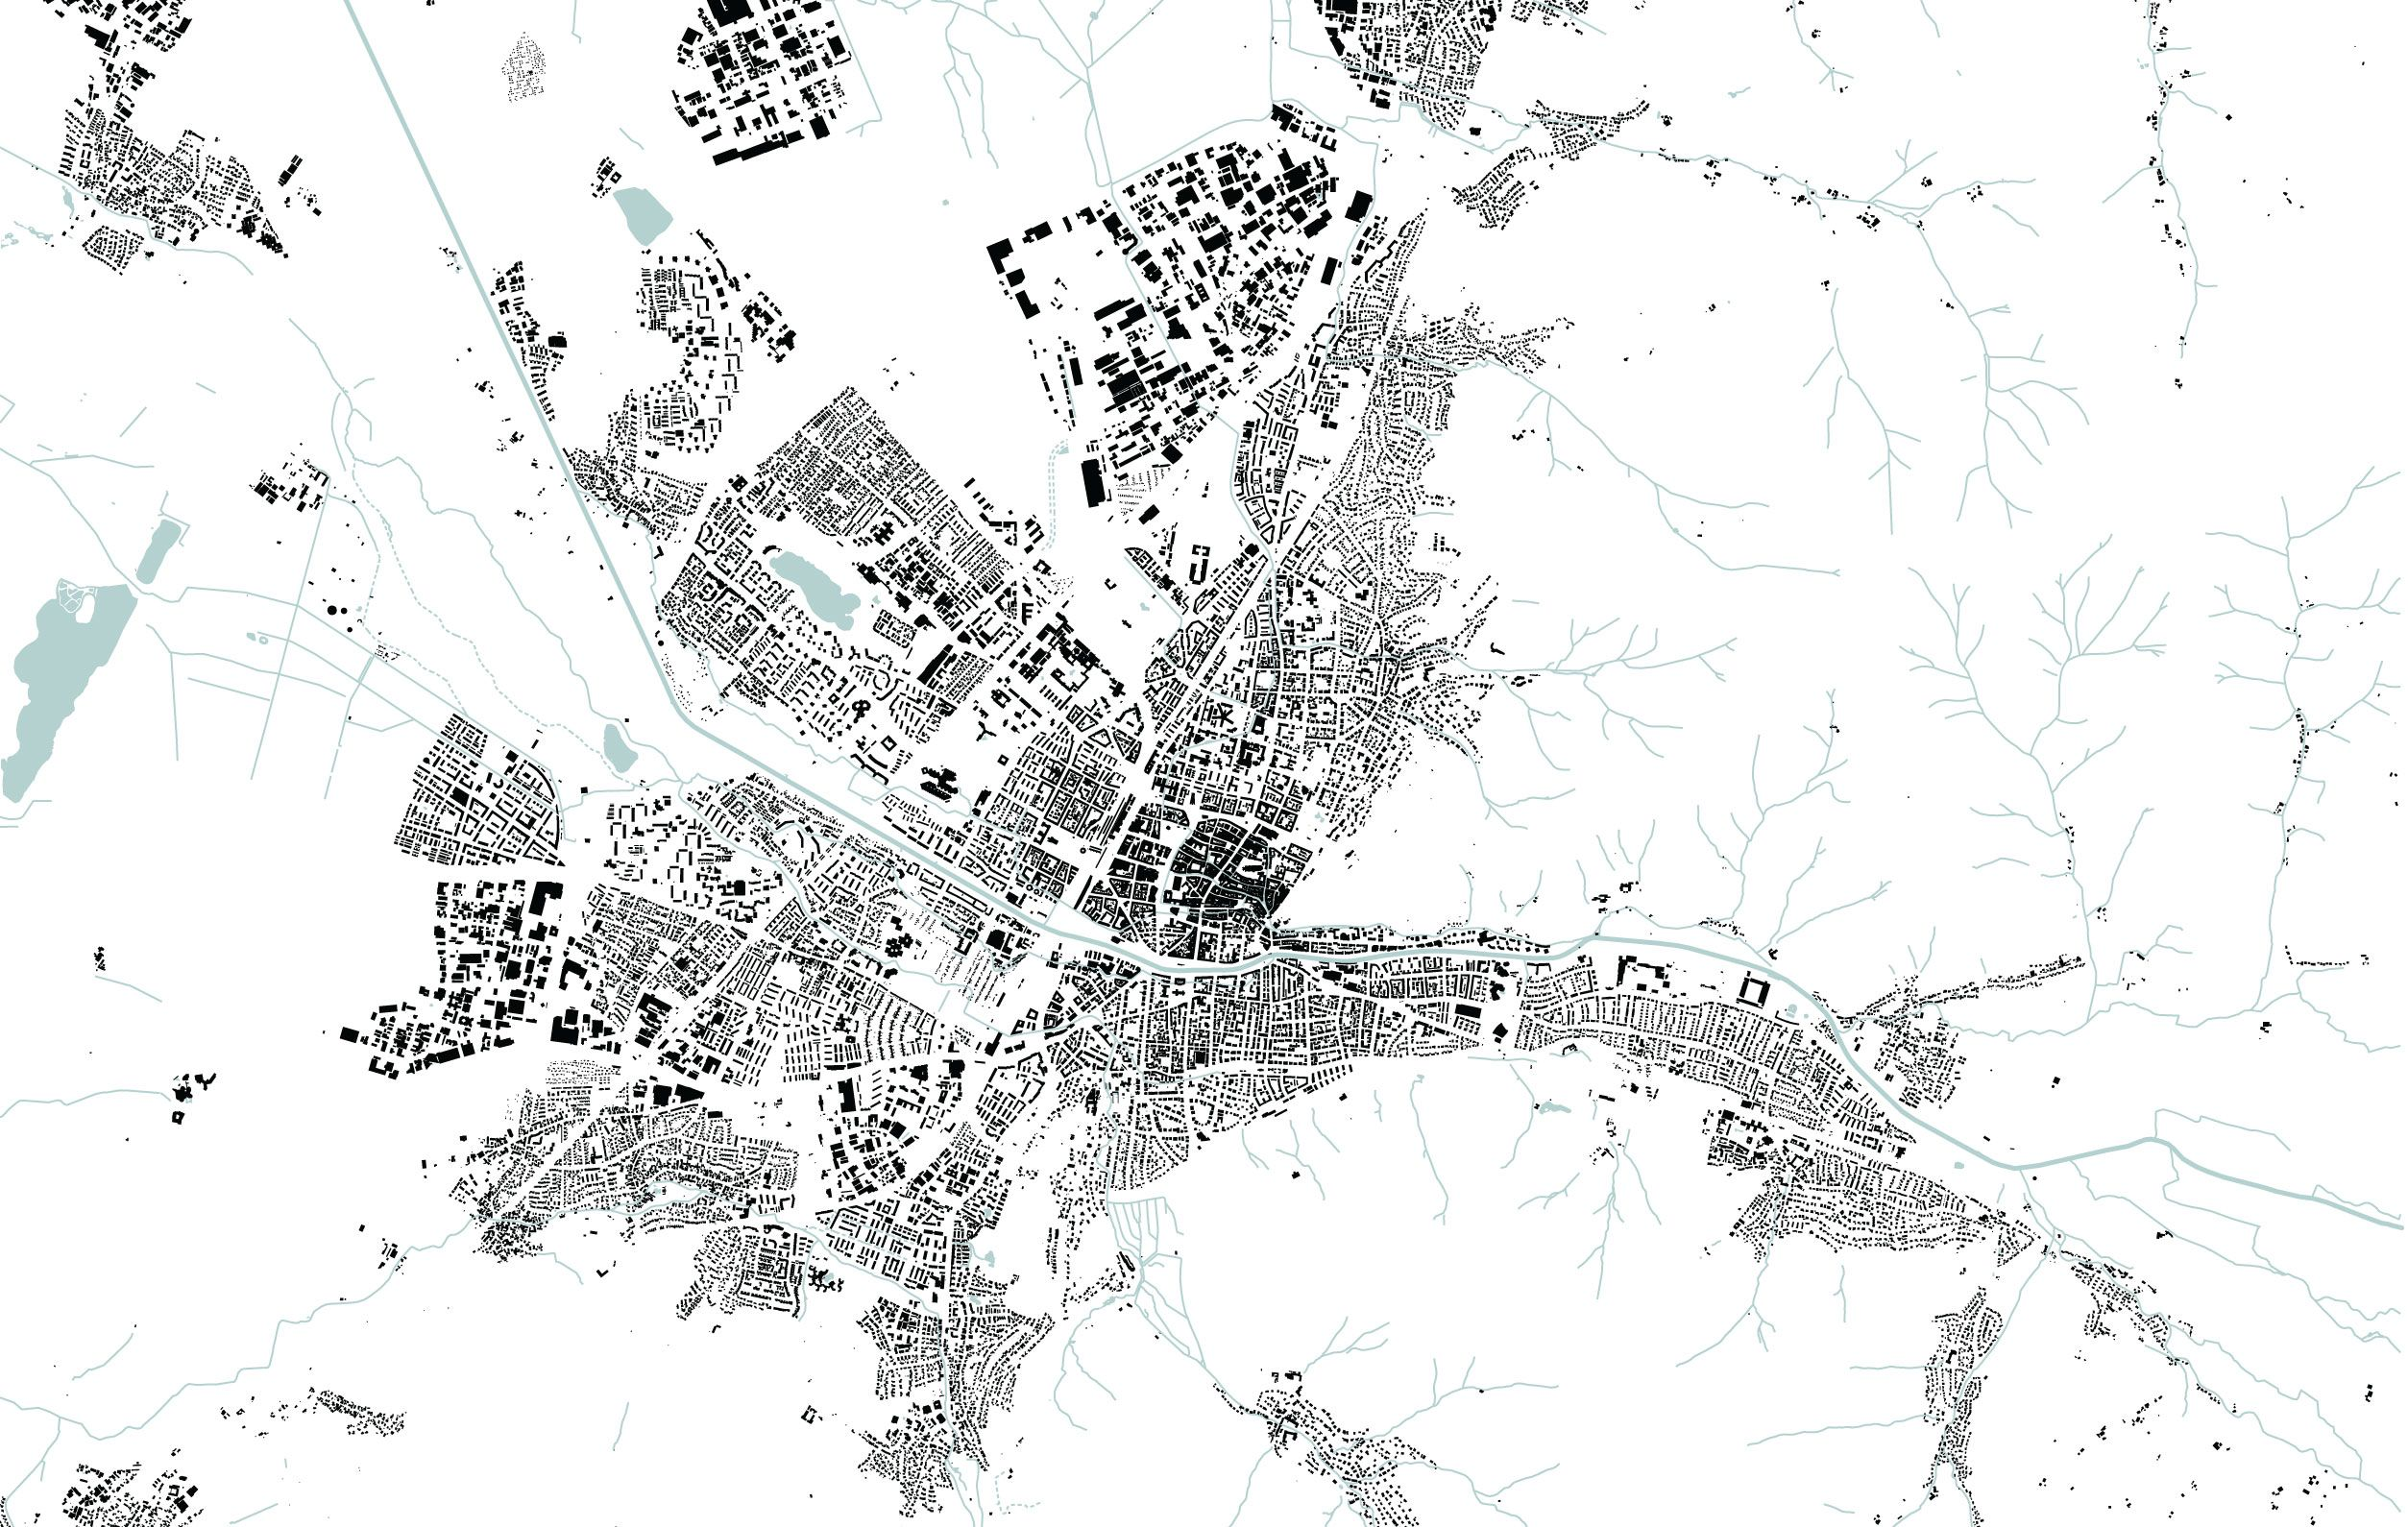 Freiburg Nolli map 130000 schwarzplan Pinterest Freiburg